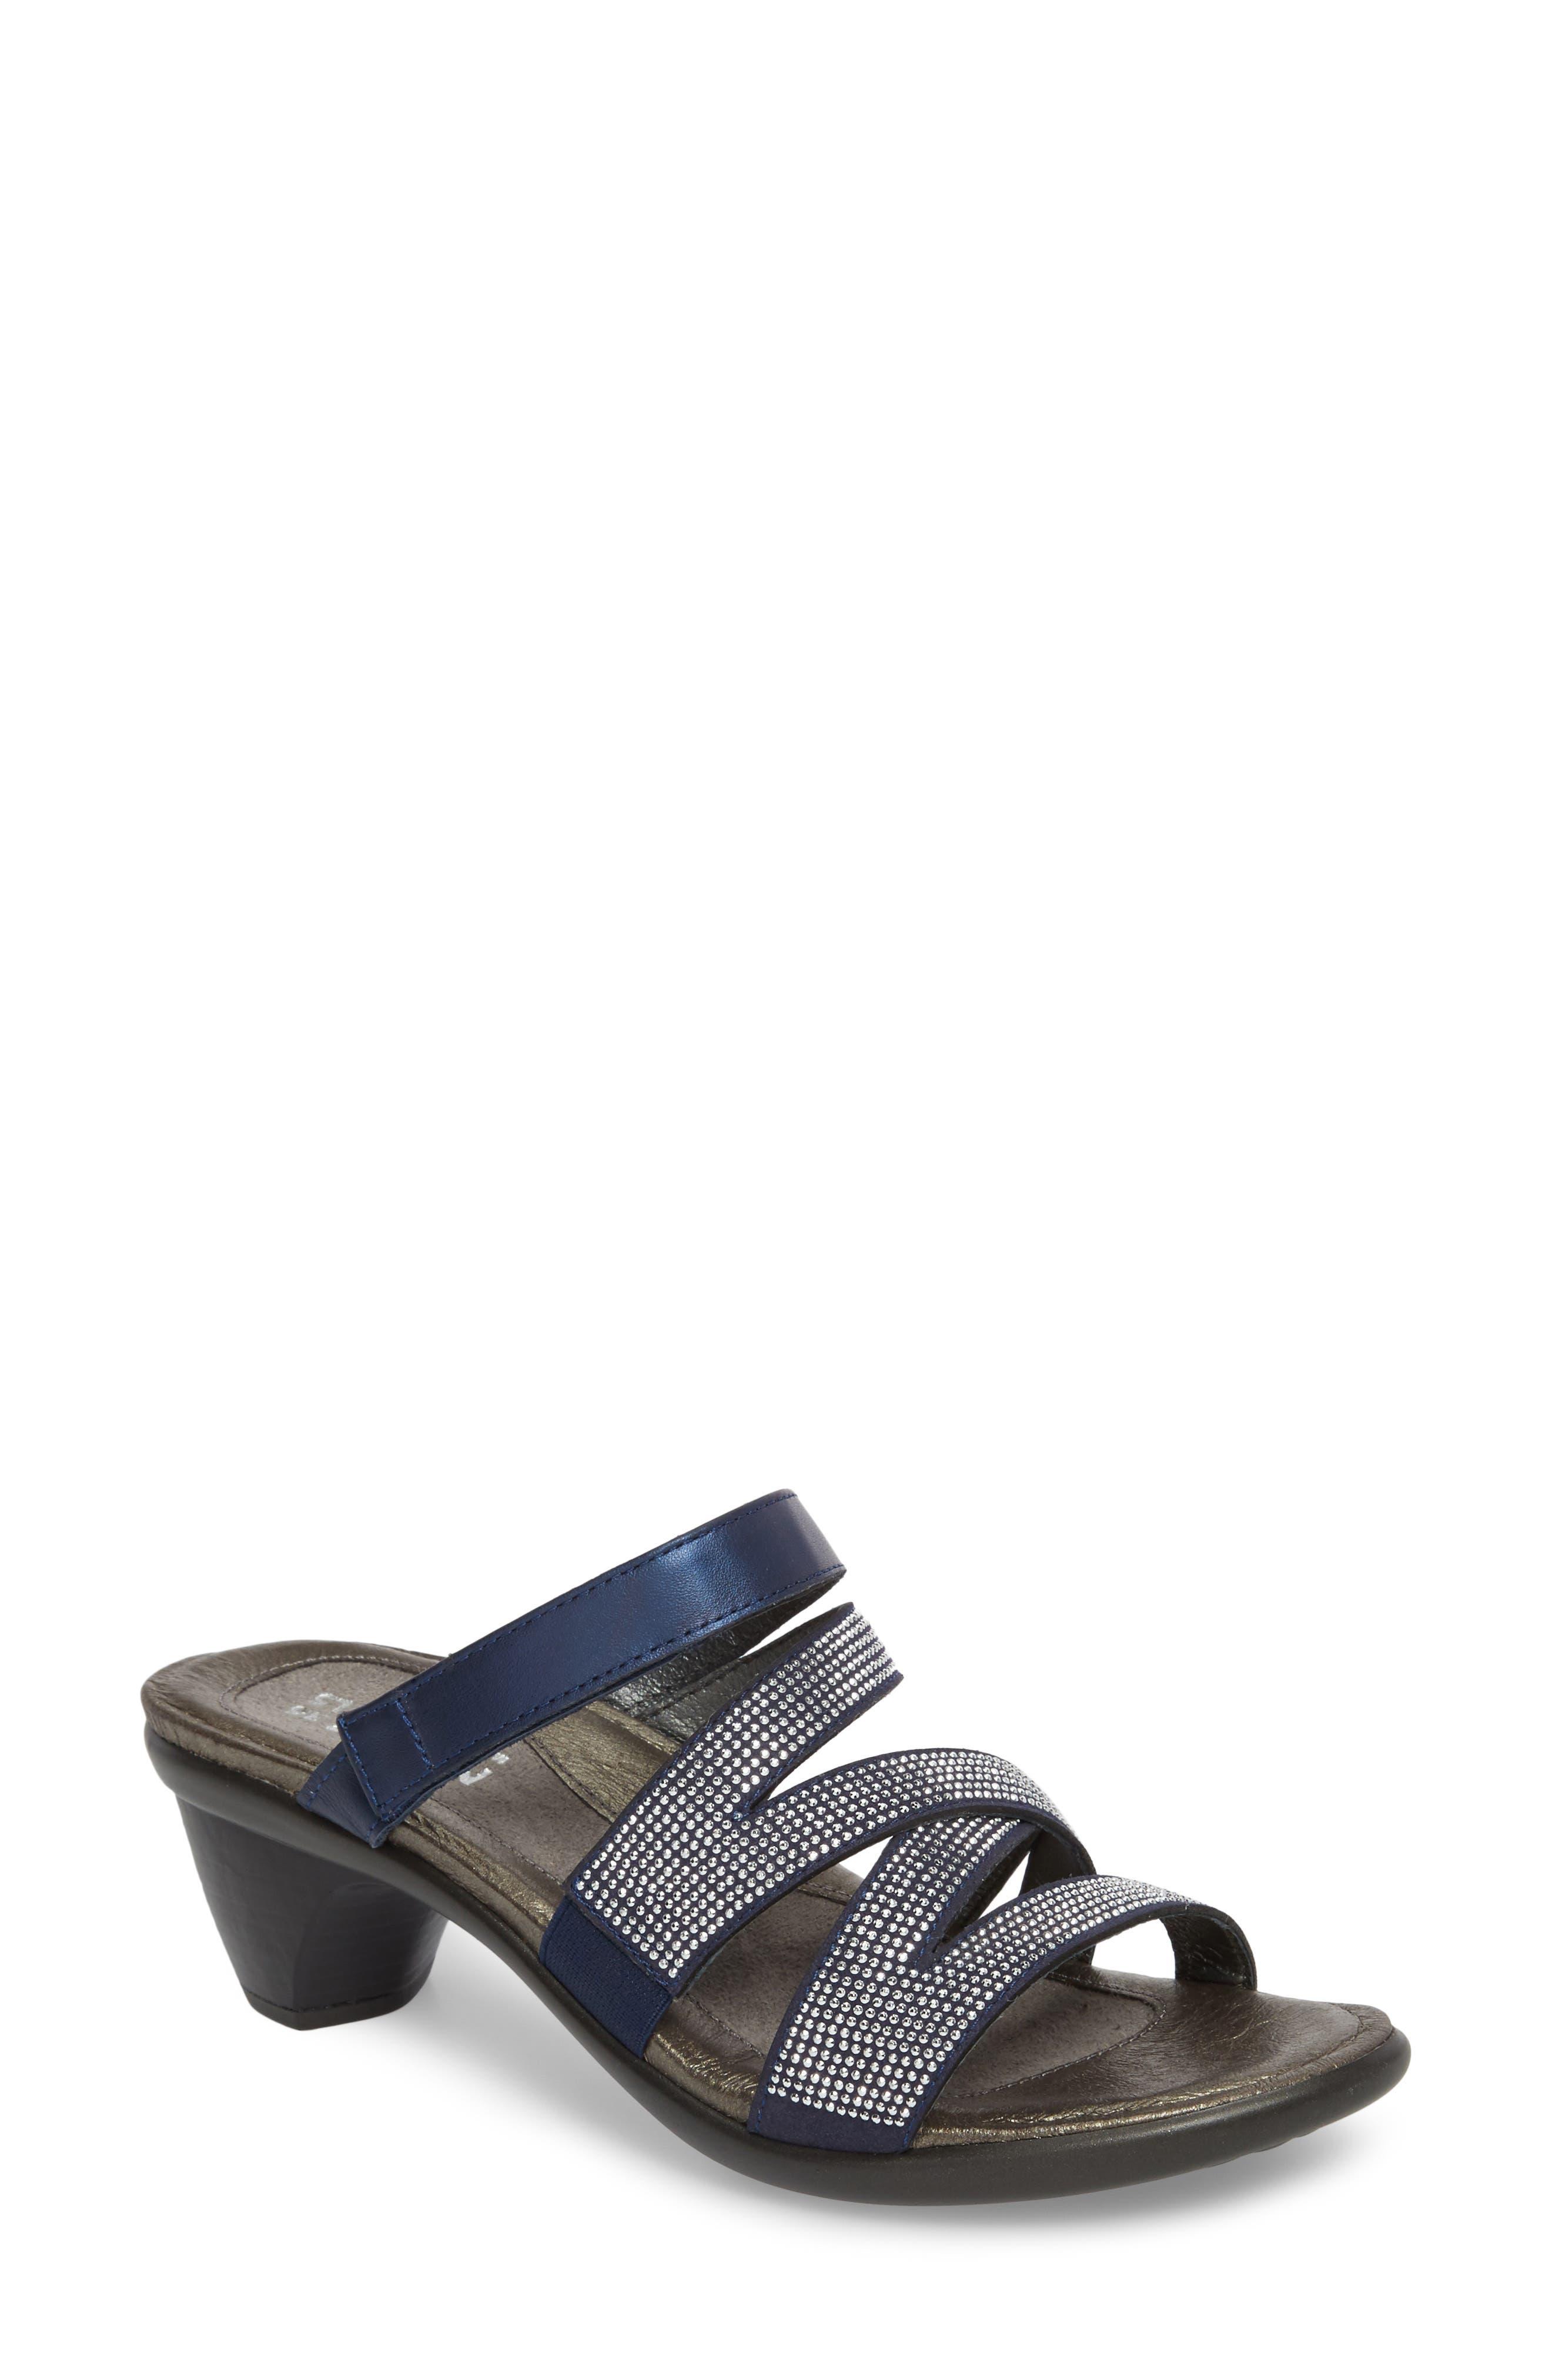 NAOT, Formal Sandal, Main thumbnail 1, color, DARK BLUE LEATHER